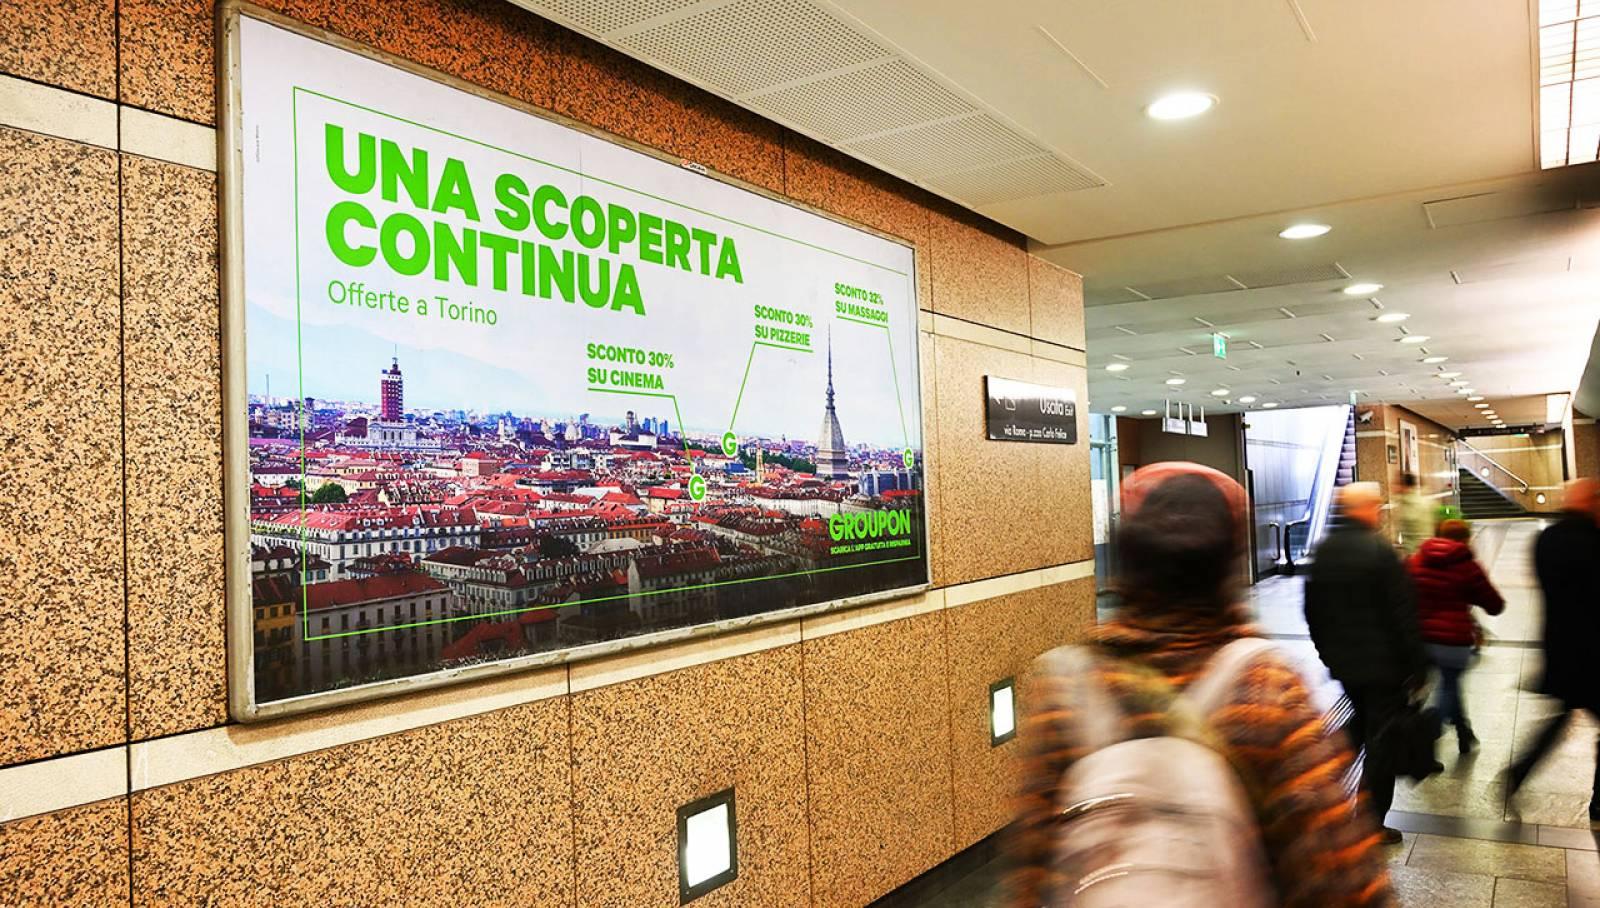 Circuito a copertura landscape a Torino IGPDecaux per Groupon